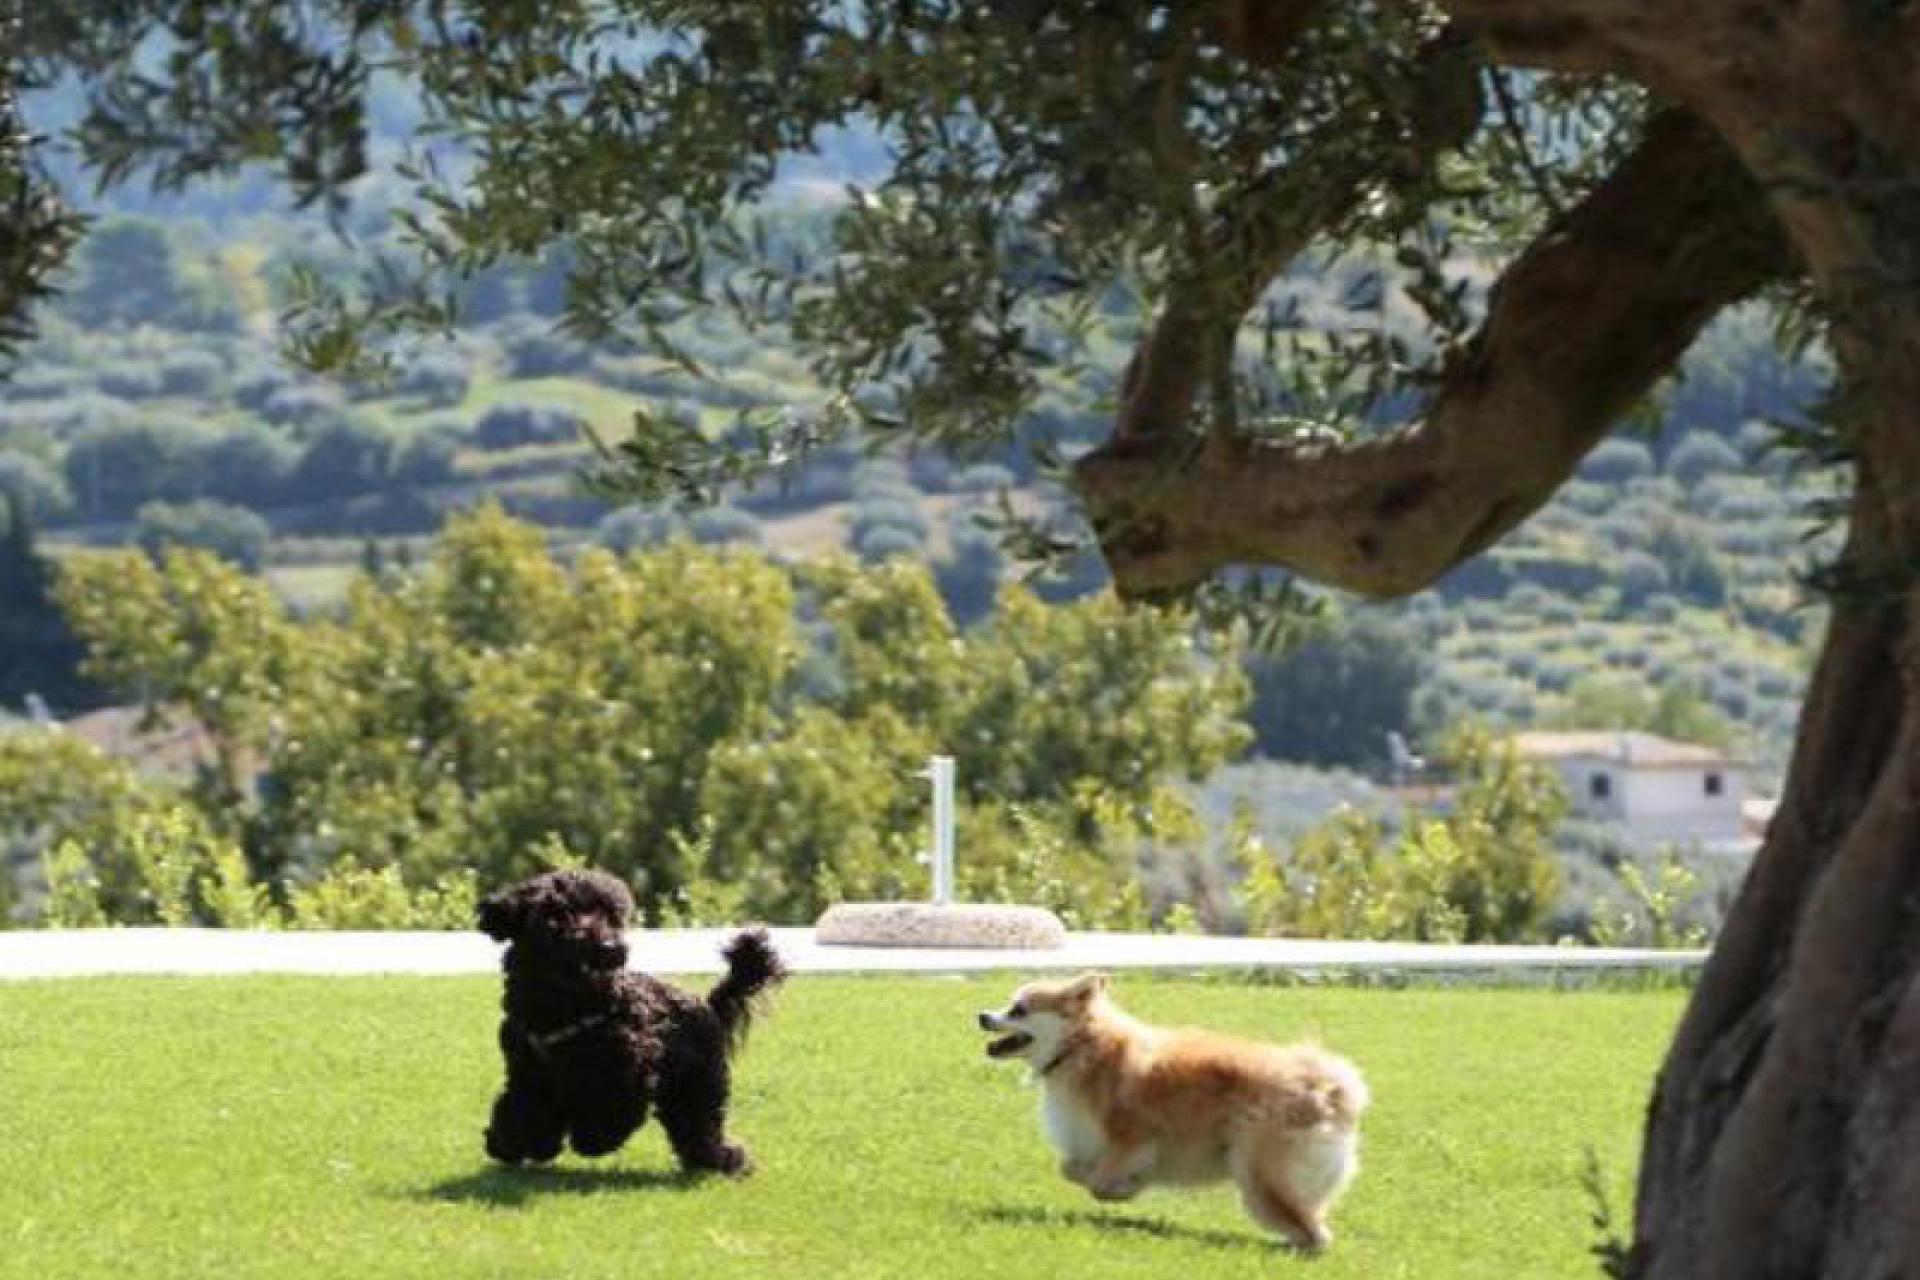 Agriturismo Sicilie Tussen olijf- en amandelbomen verscholen knusse agriturismo